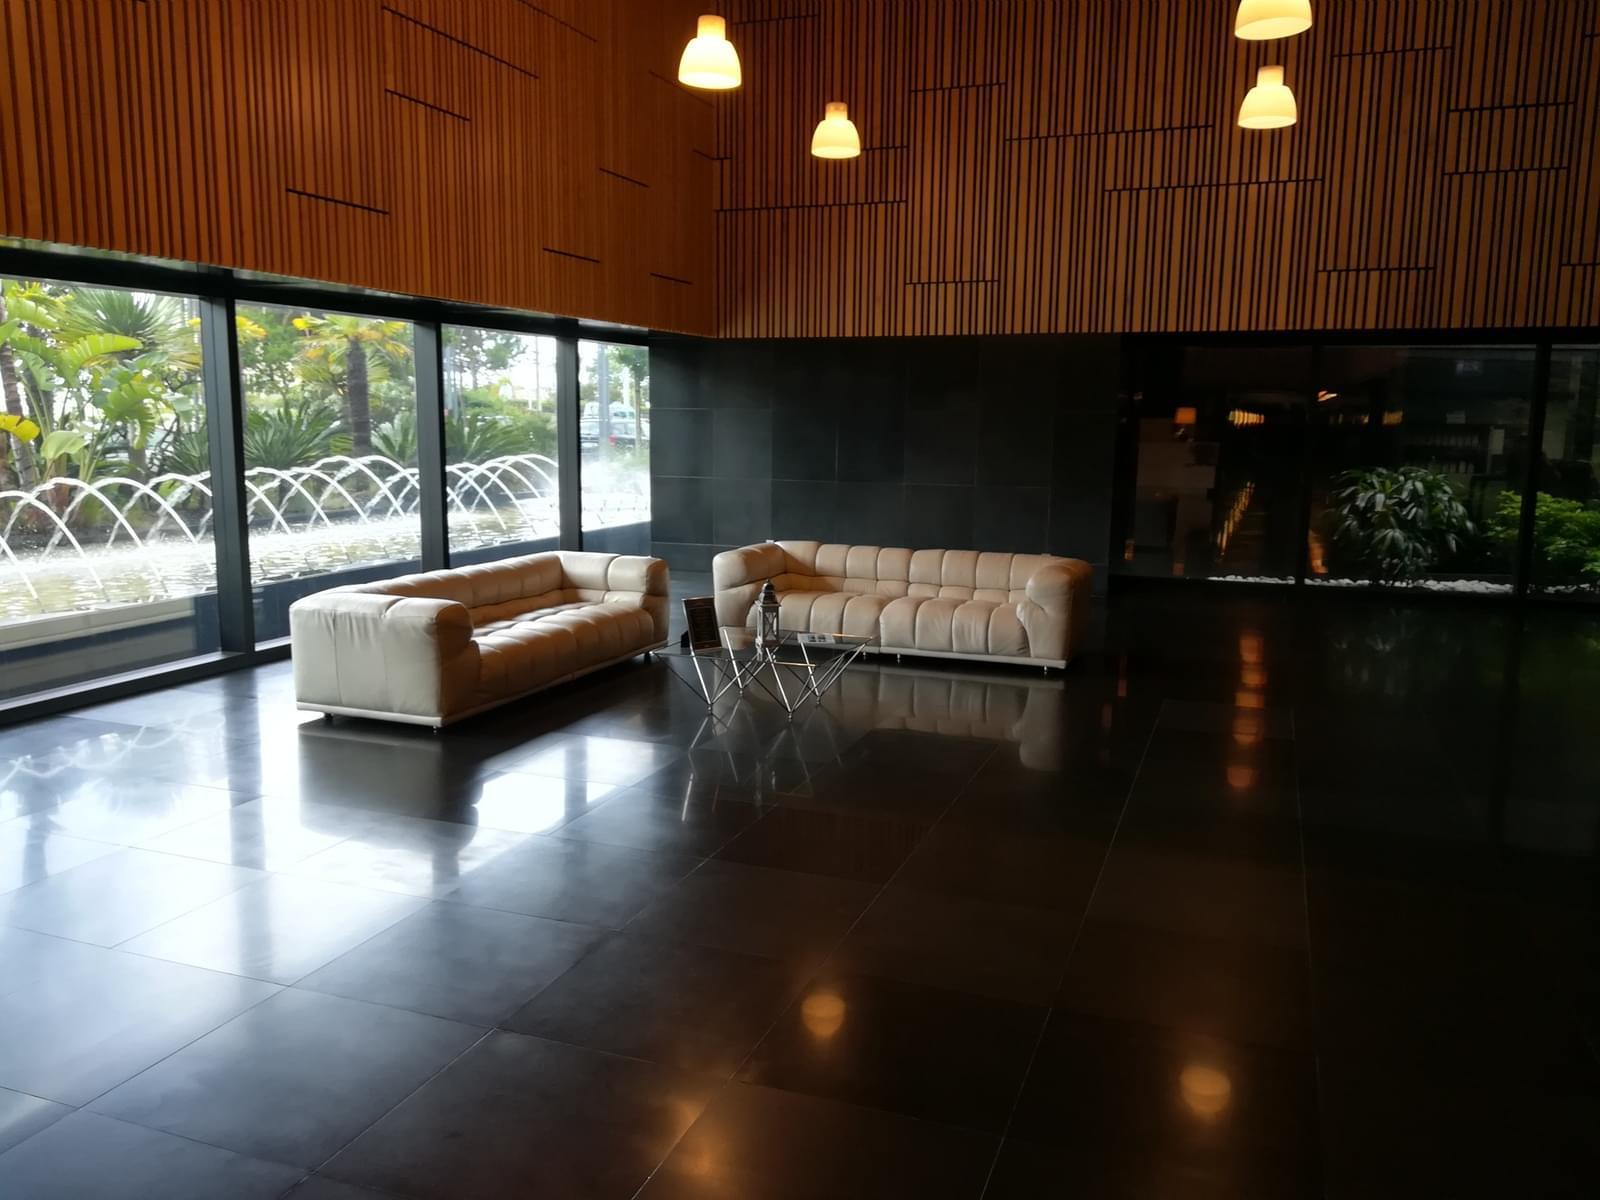 pf17354-apartamento-t1-cascais-2eae460d-9dbe-456c-be1c-cdcbc9304381